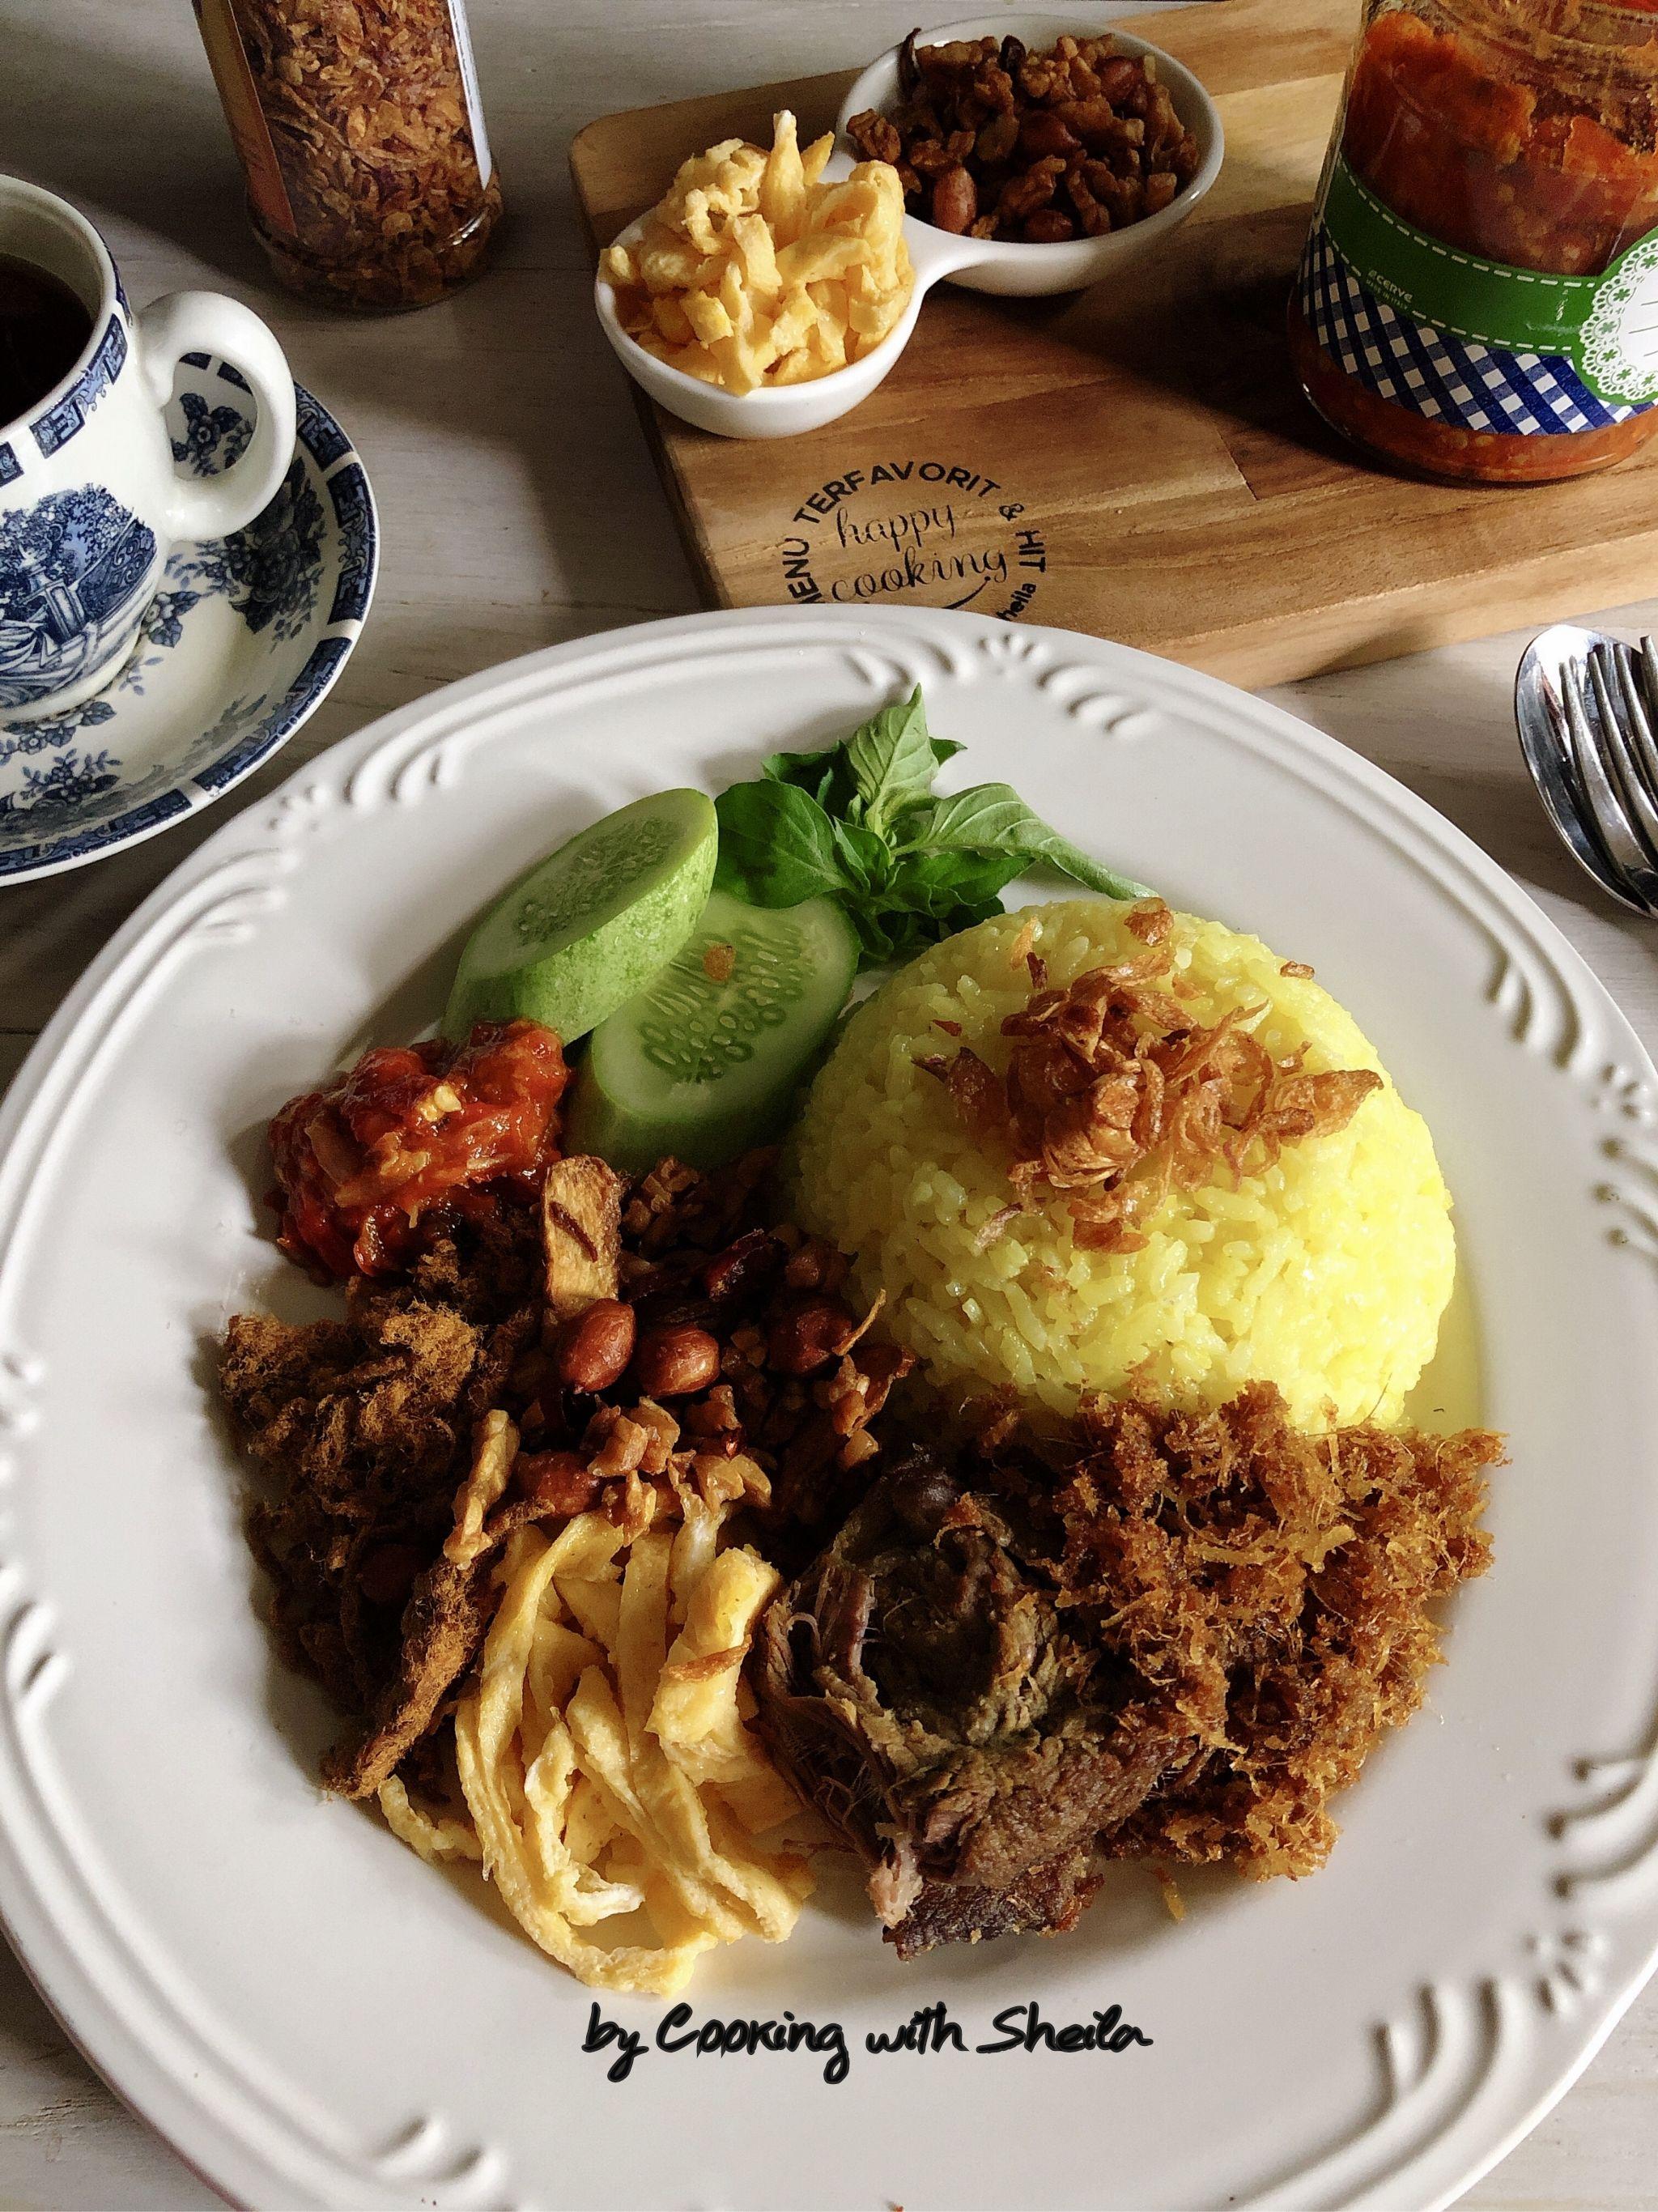 Nasi Kuning Rice Cooker : kuning, cooker, Kuning, Cooker, Makanan,, Memasak,, Resep, Masakan, Indonesia